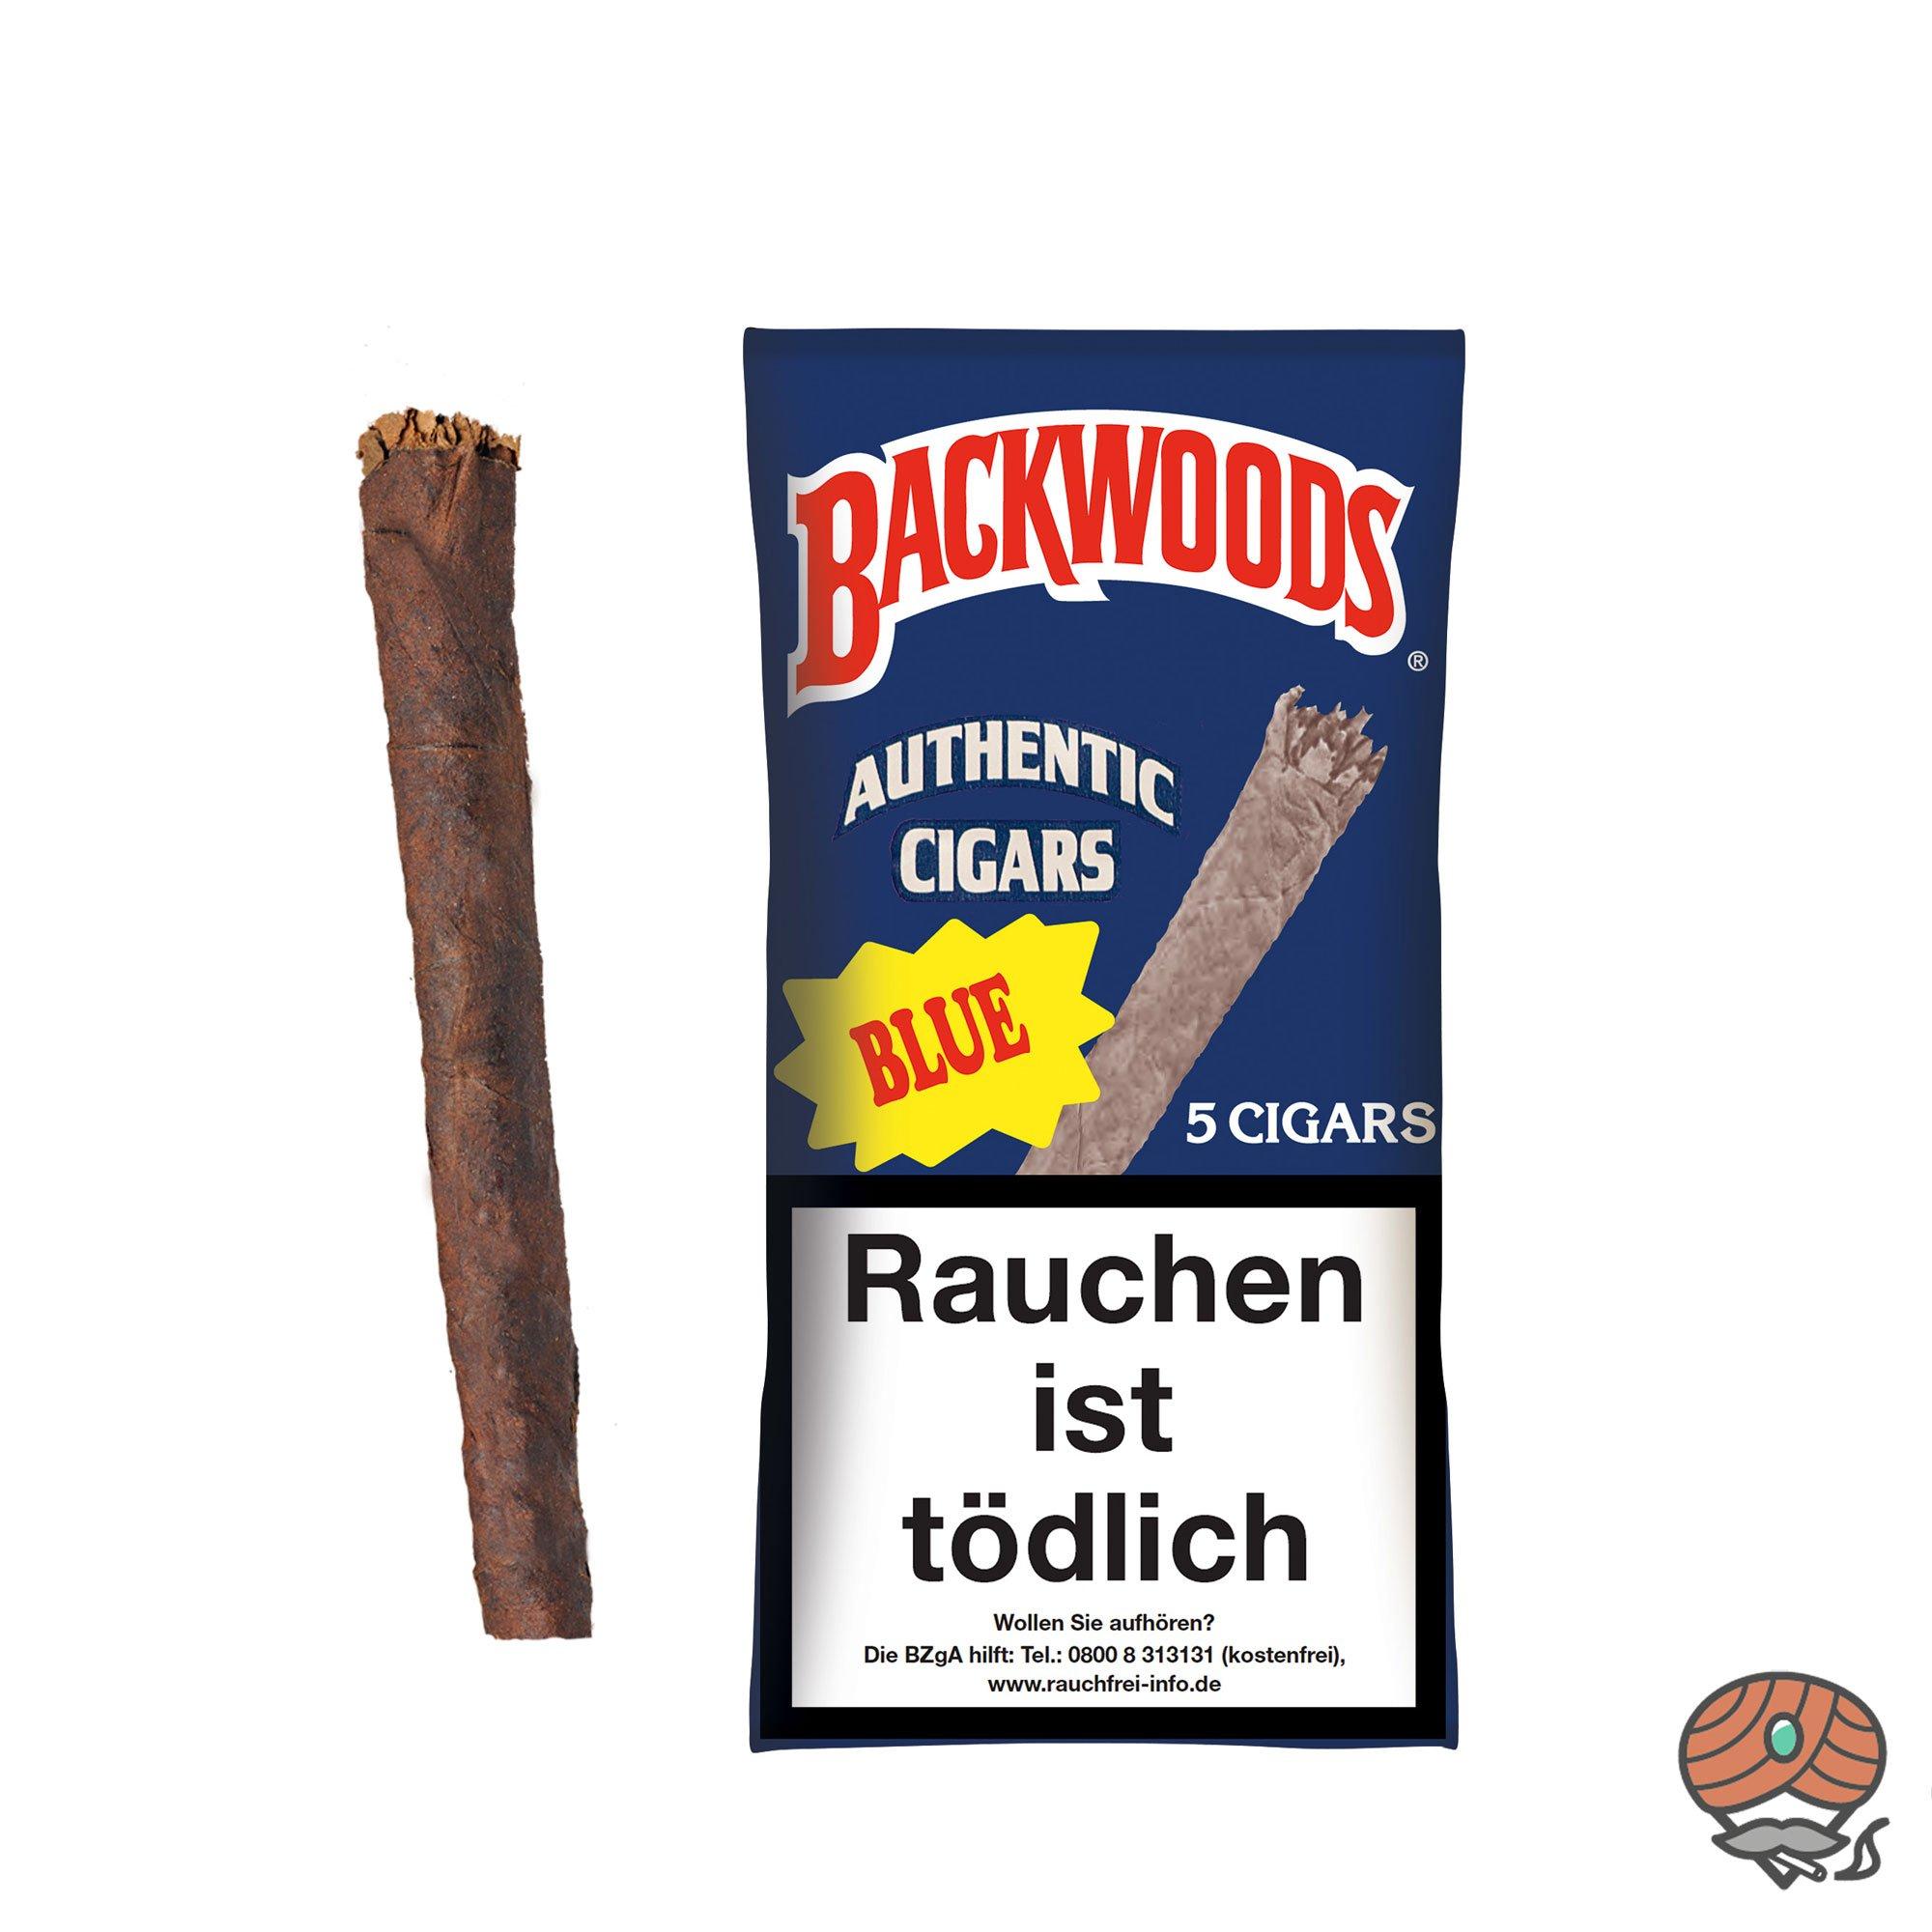 Backwoods Blue Authentic Cigars 5 Stück 100% Tabak im Humipack